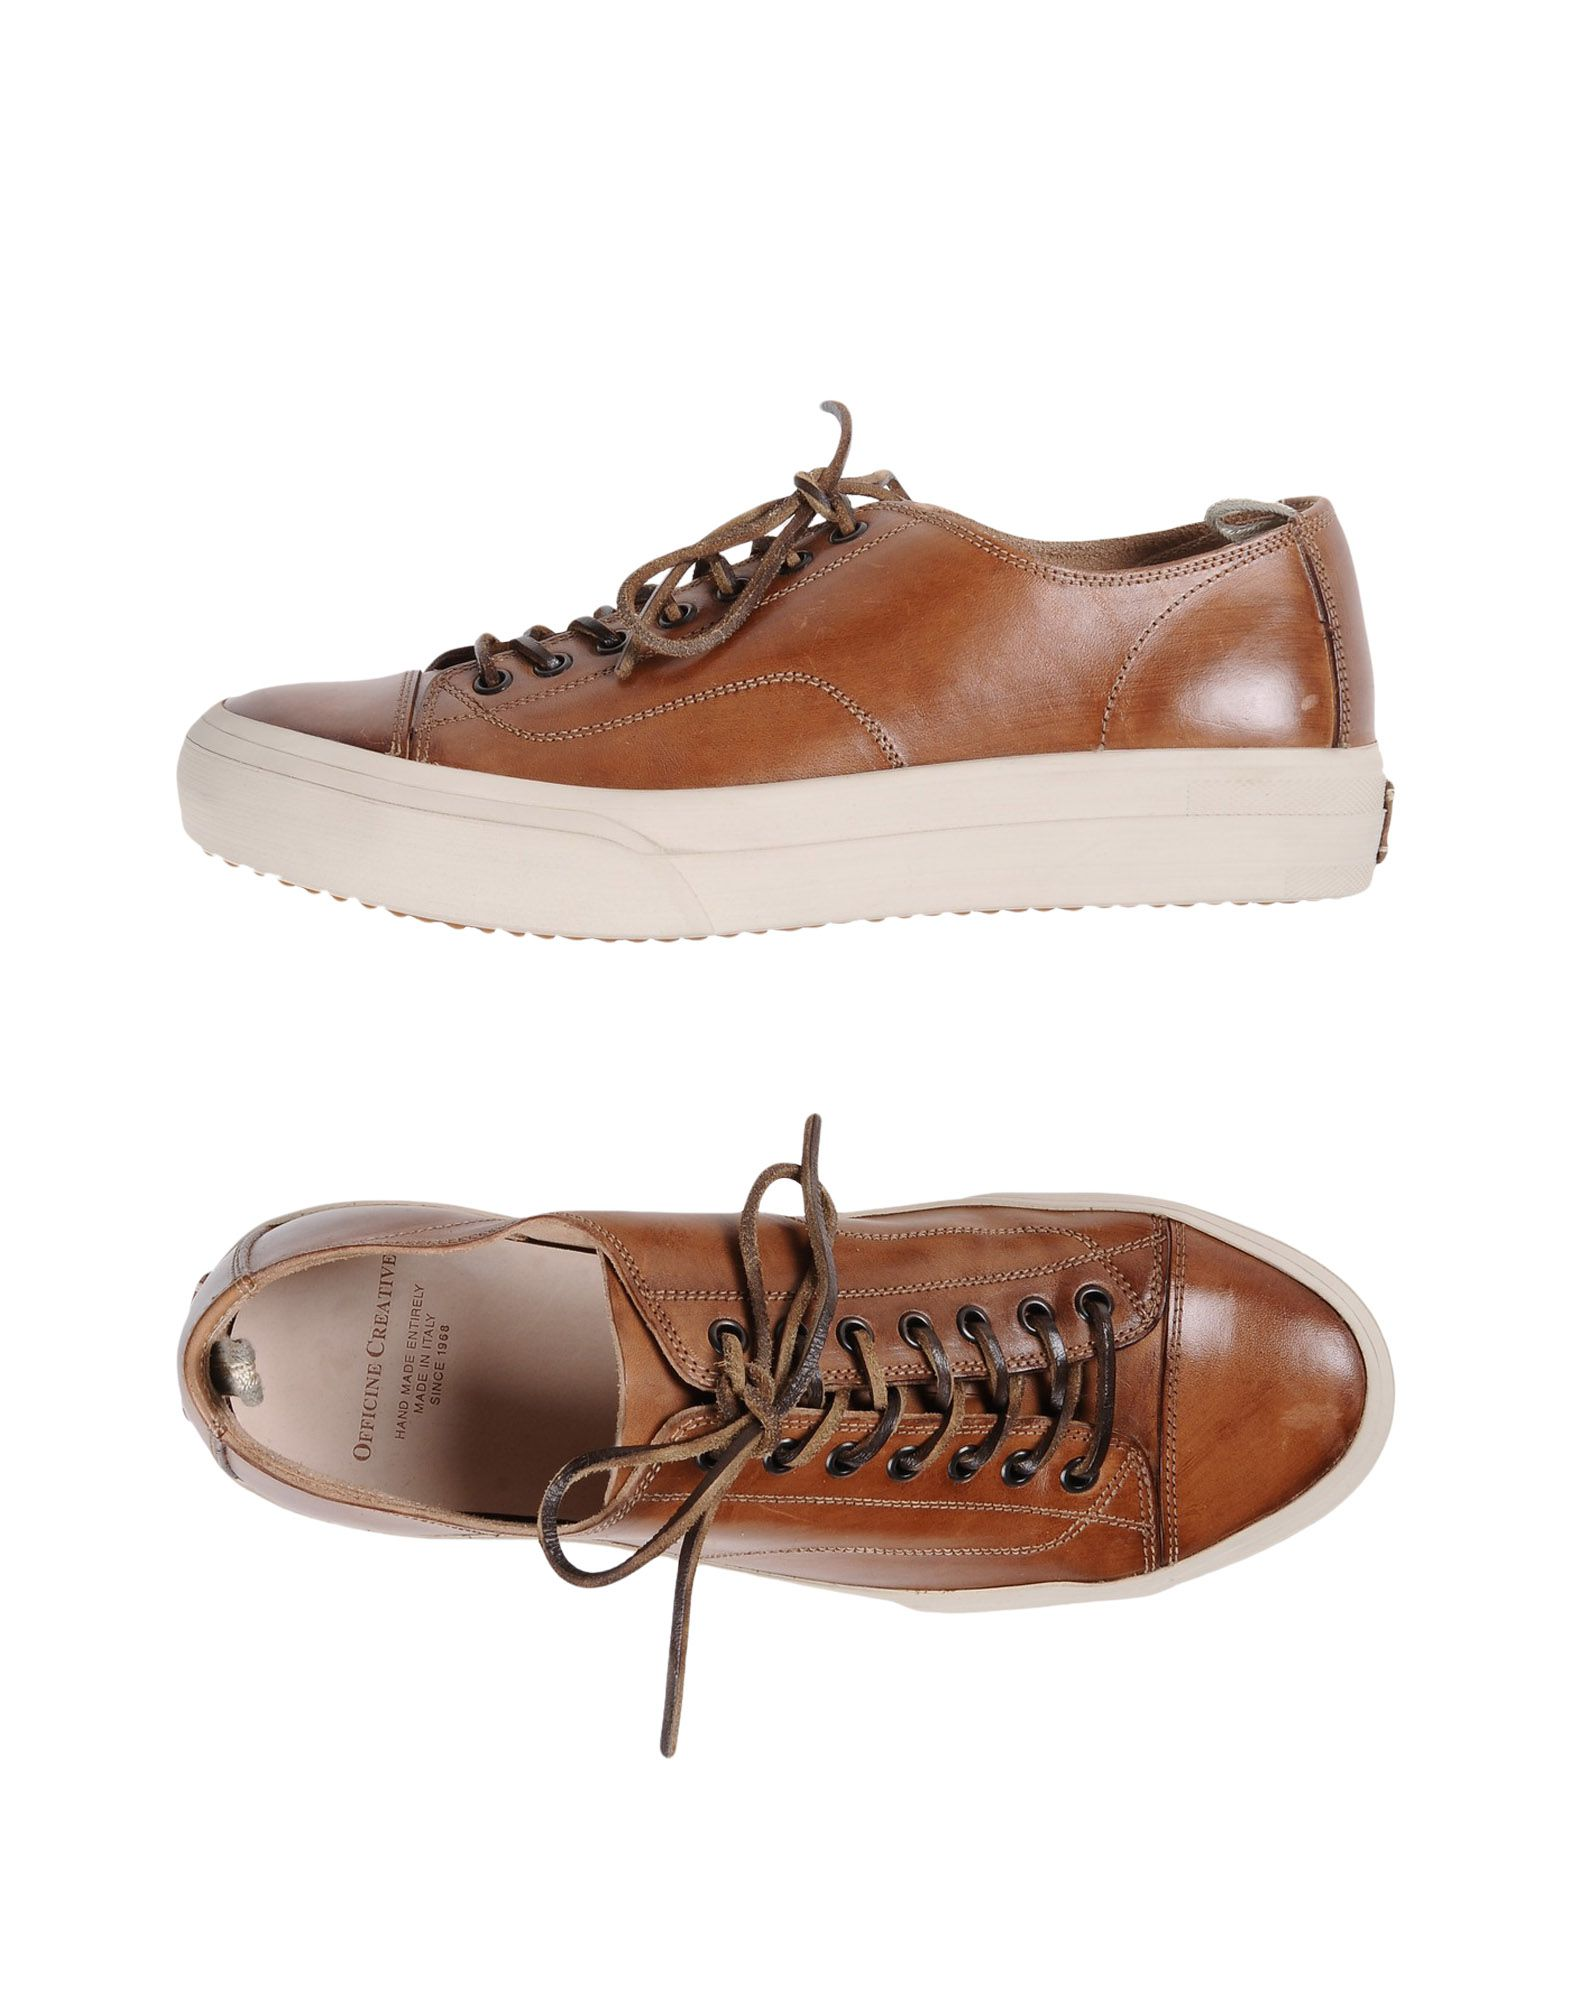 Officine Creative Italia Gute Sneakers Herren  11217499DB Gute Italia Qualität beliebte Schuhe b2eda0